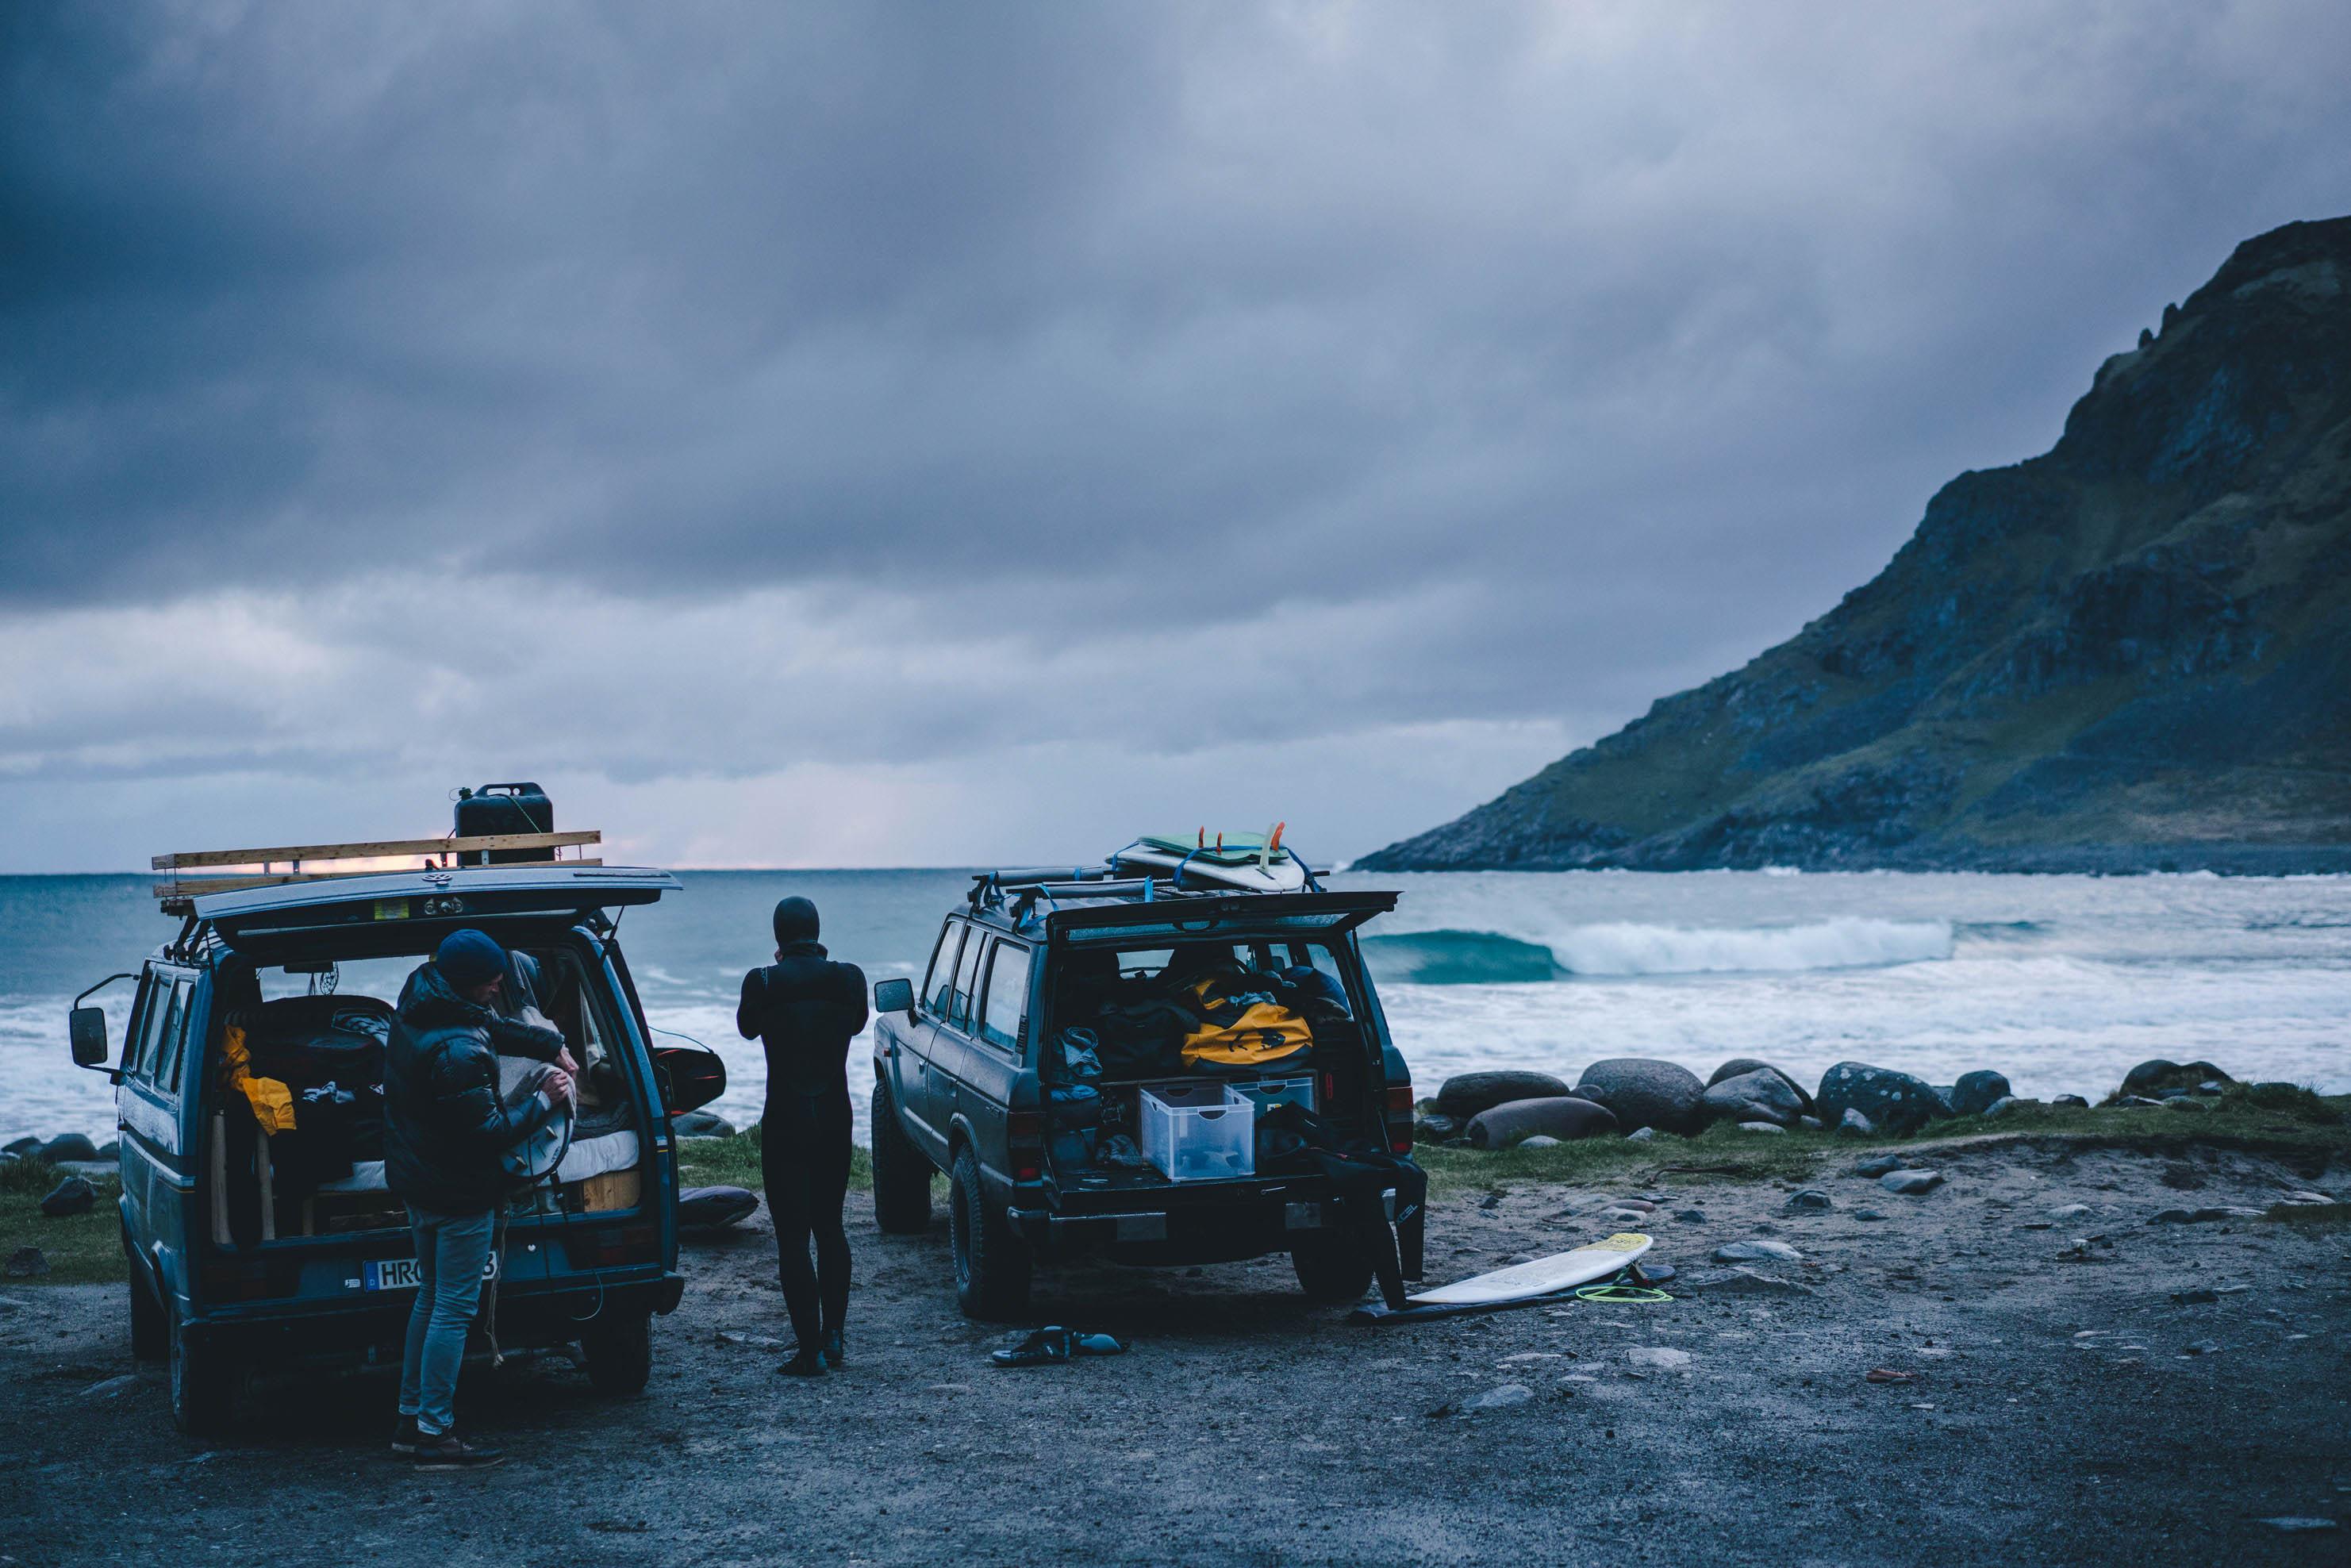 Surf, Lofoten, outdoor photography